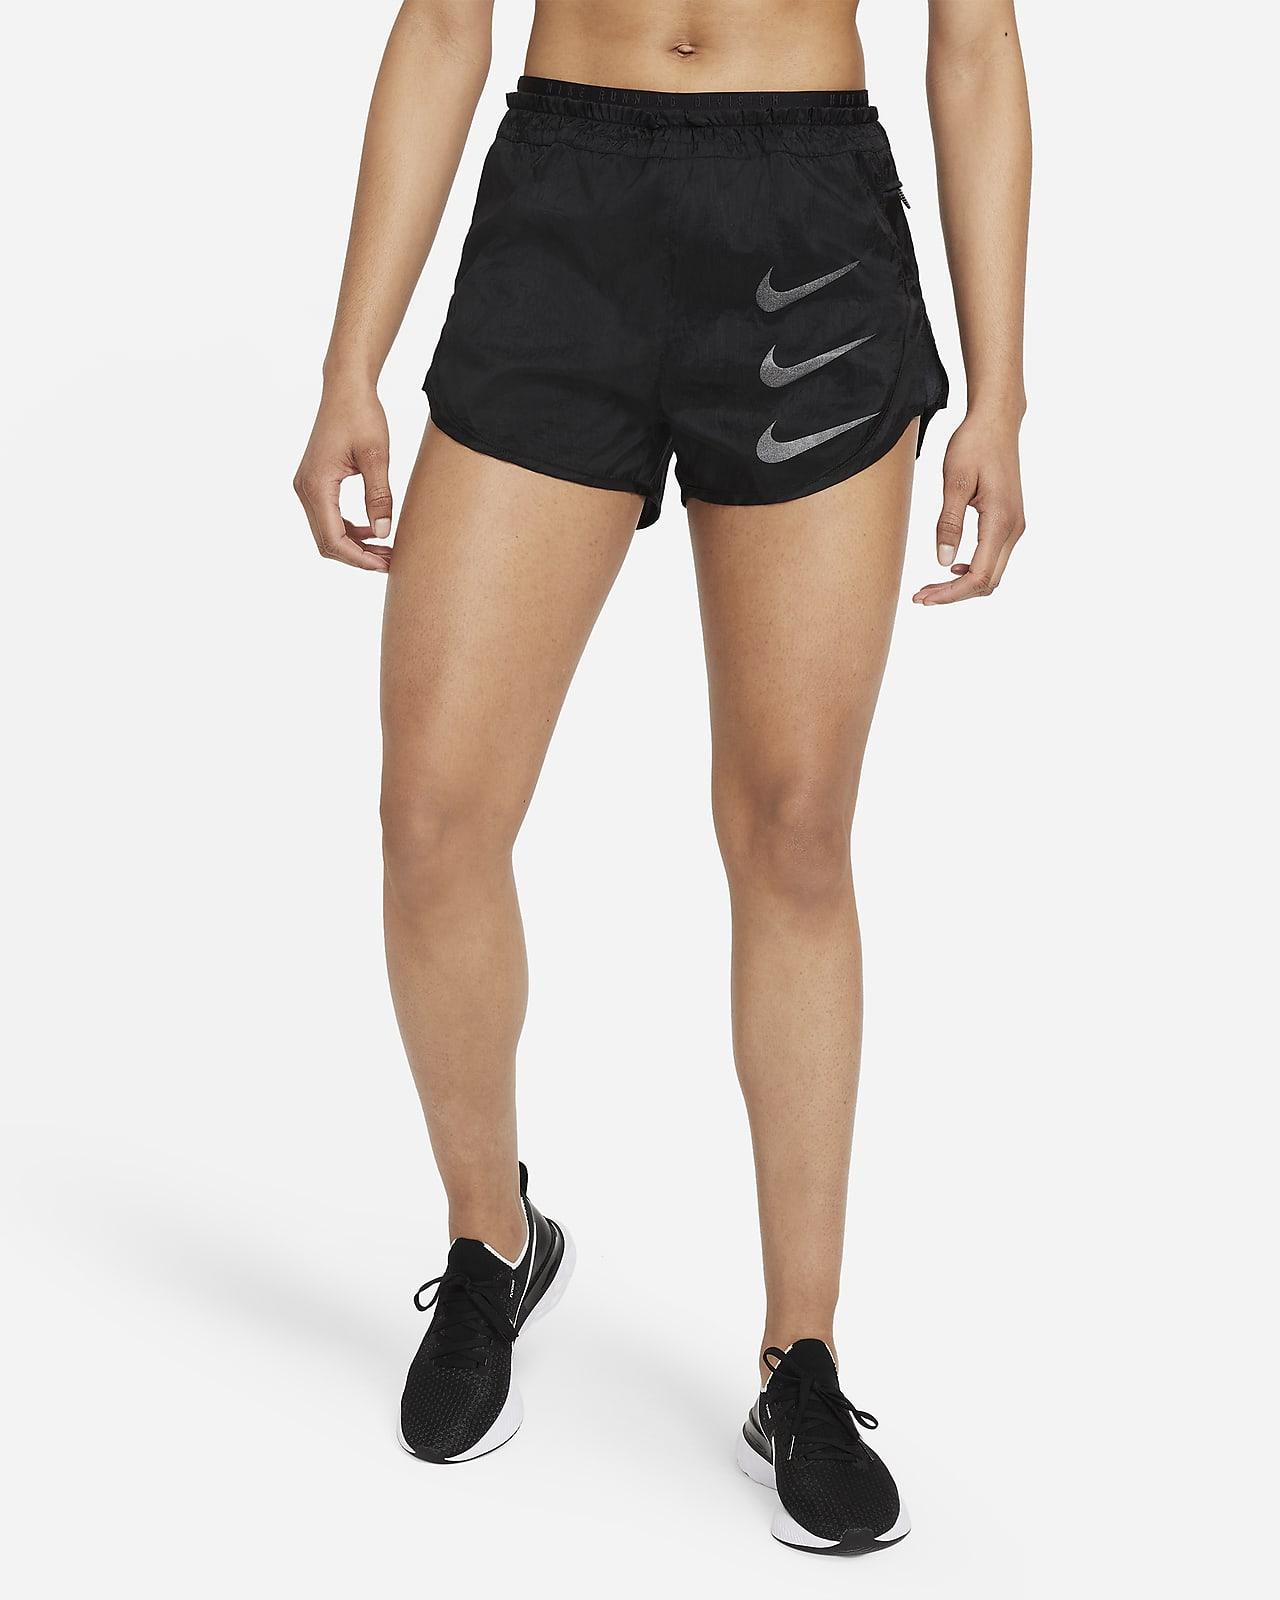 Shorts para correr 2 en 1 para mujer Nike Tempo Luxe Run Division